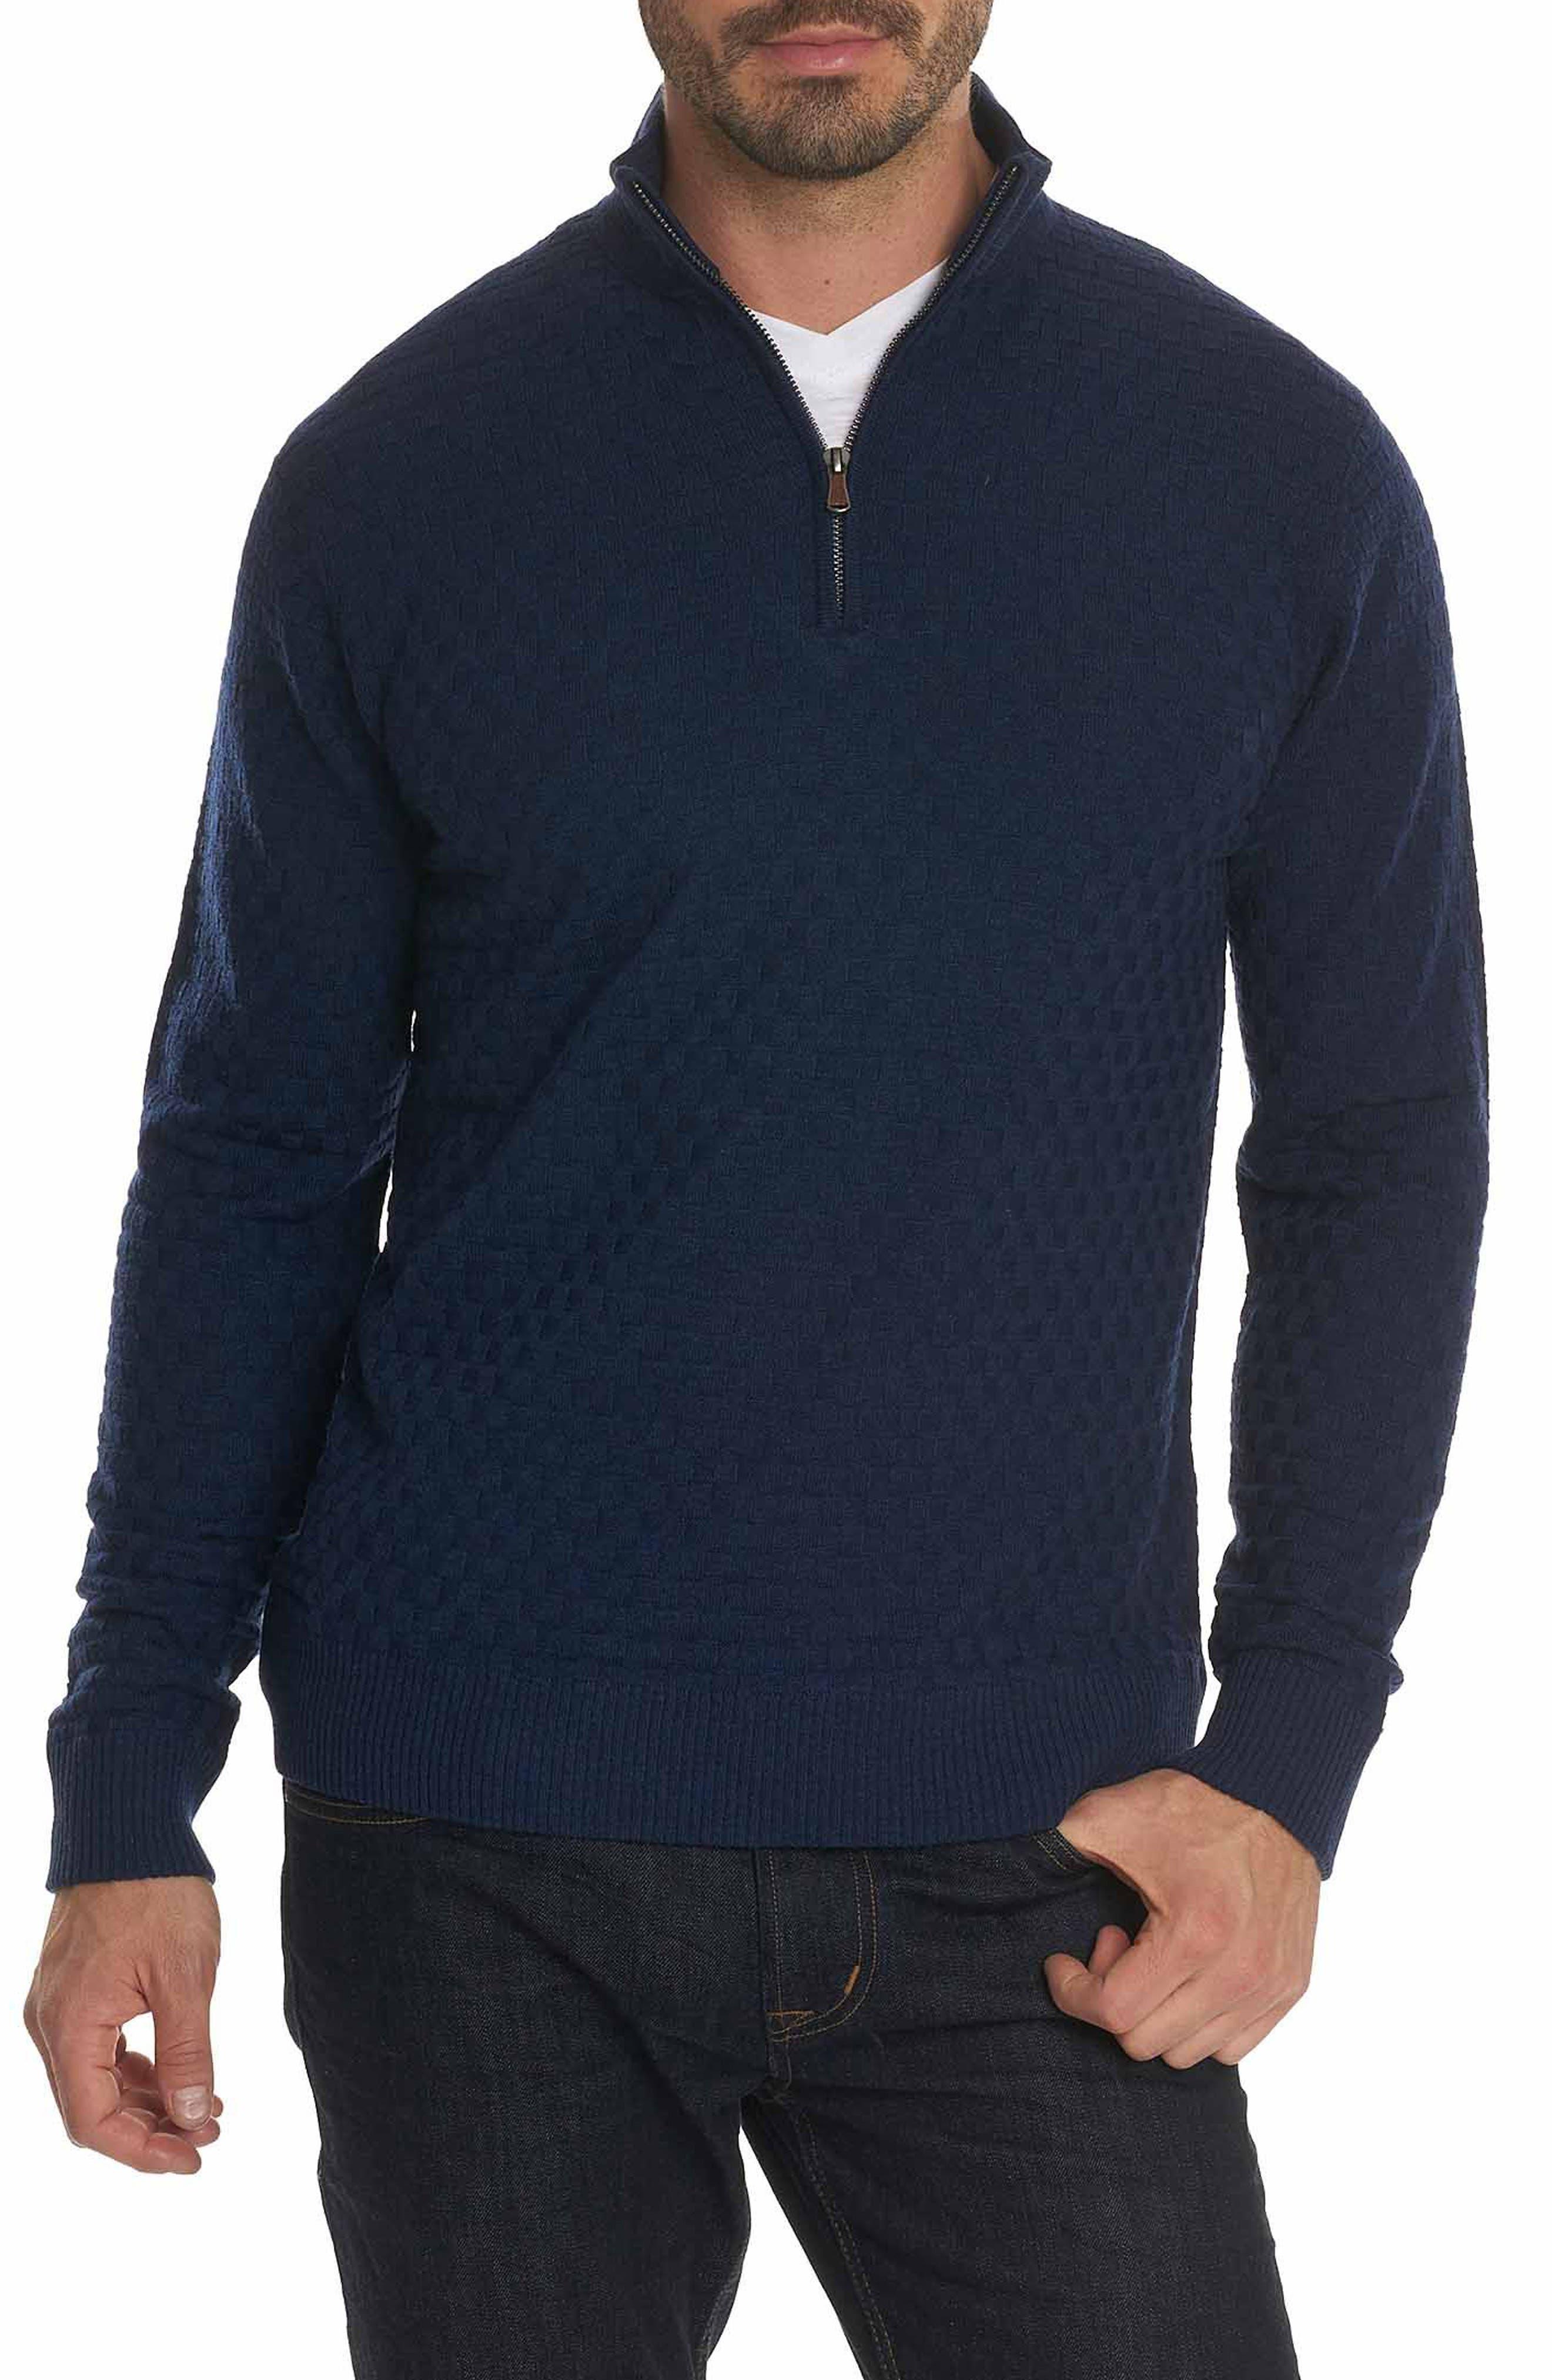 American Beech Wool Sweater,                             Main thumbnail 1, color,                             Navy